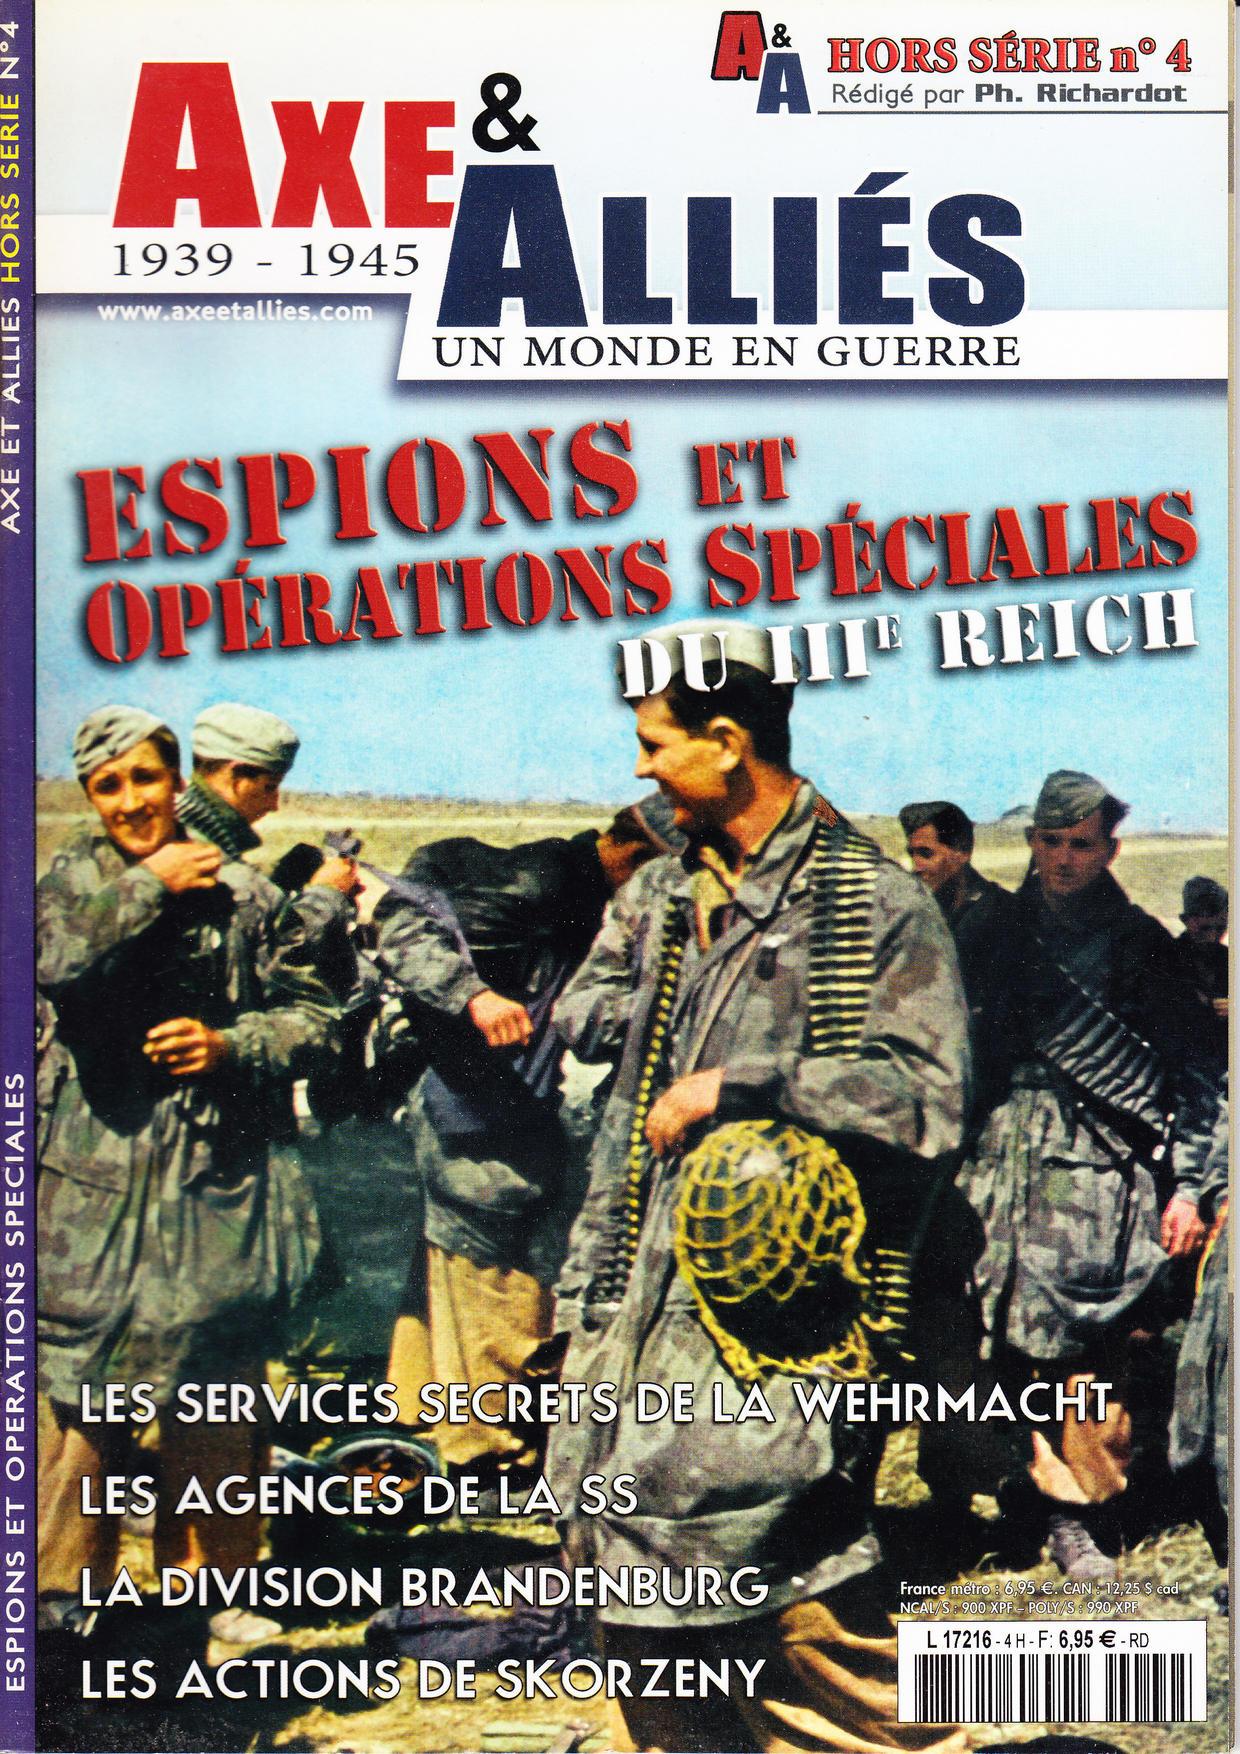 Axe & Alliés - 1939 - 1945 - Hors série 04